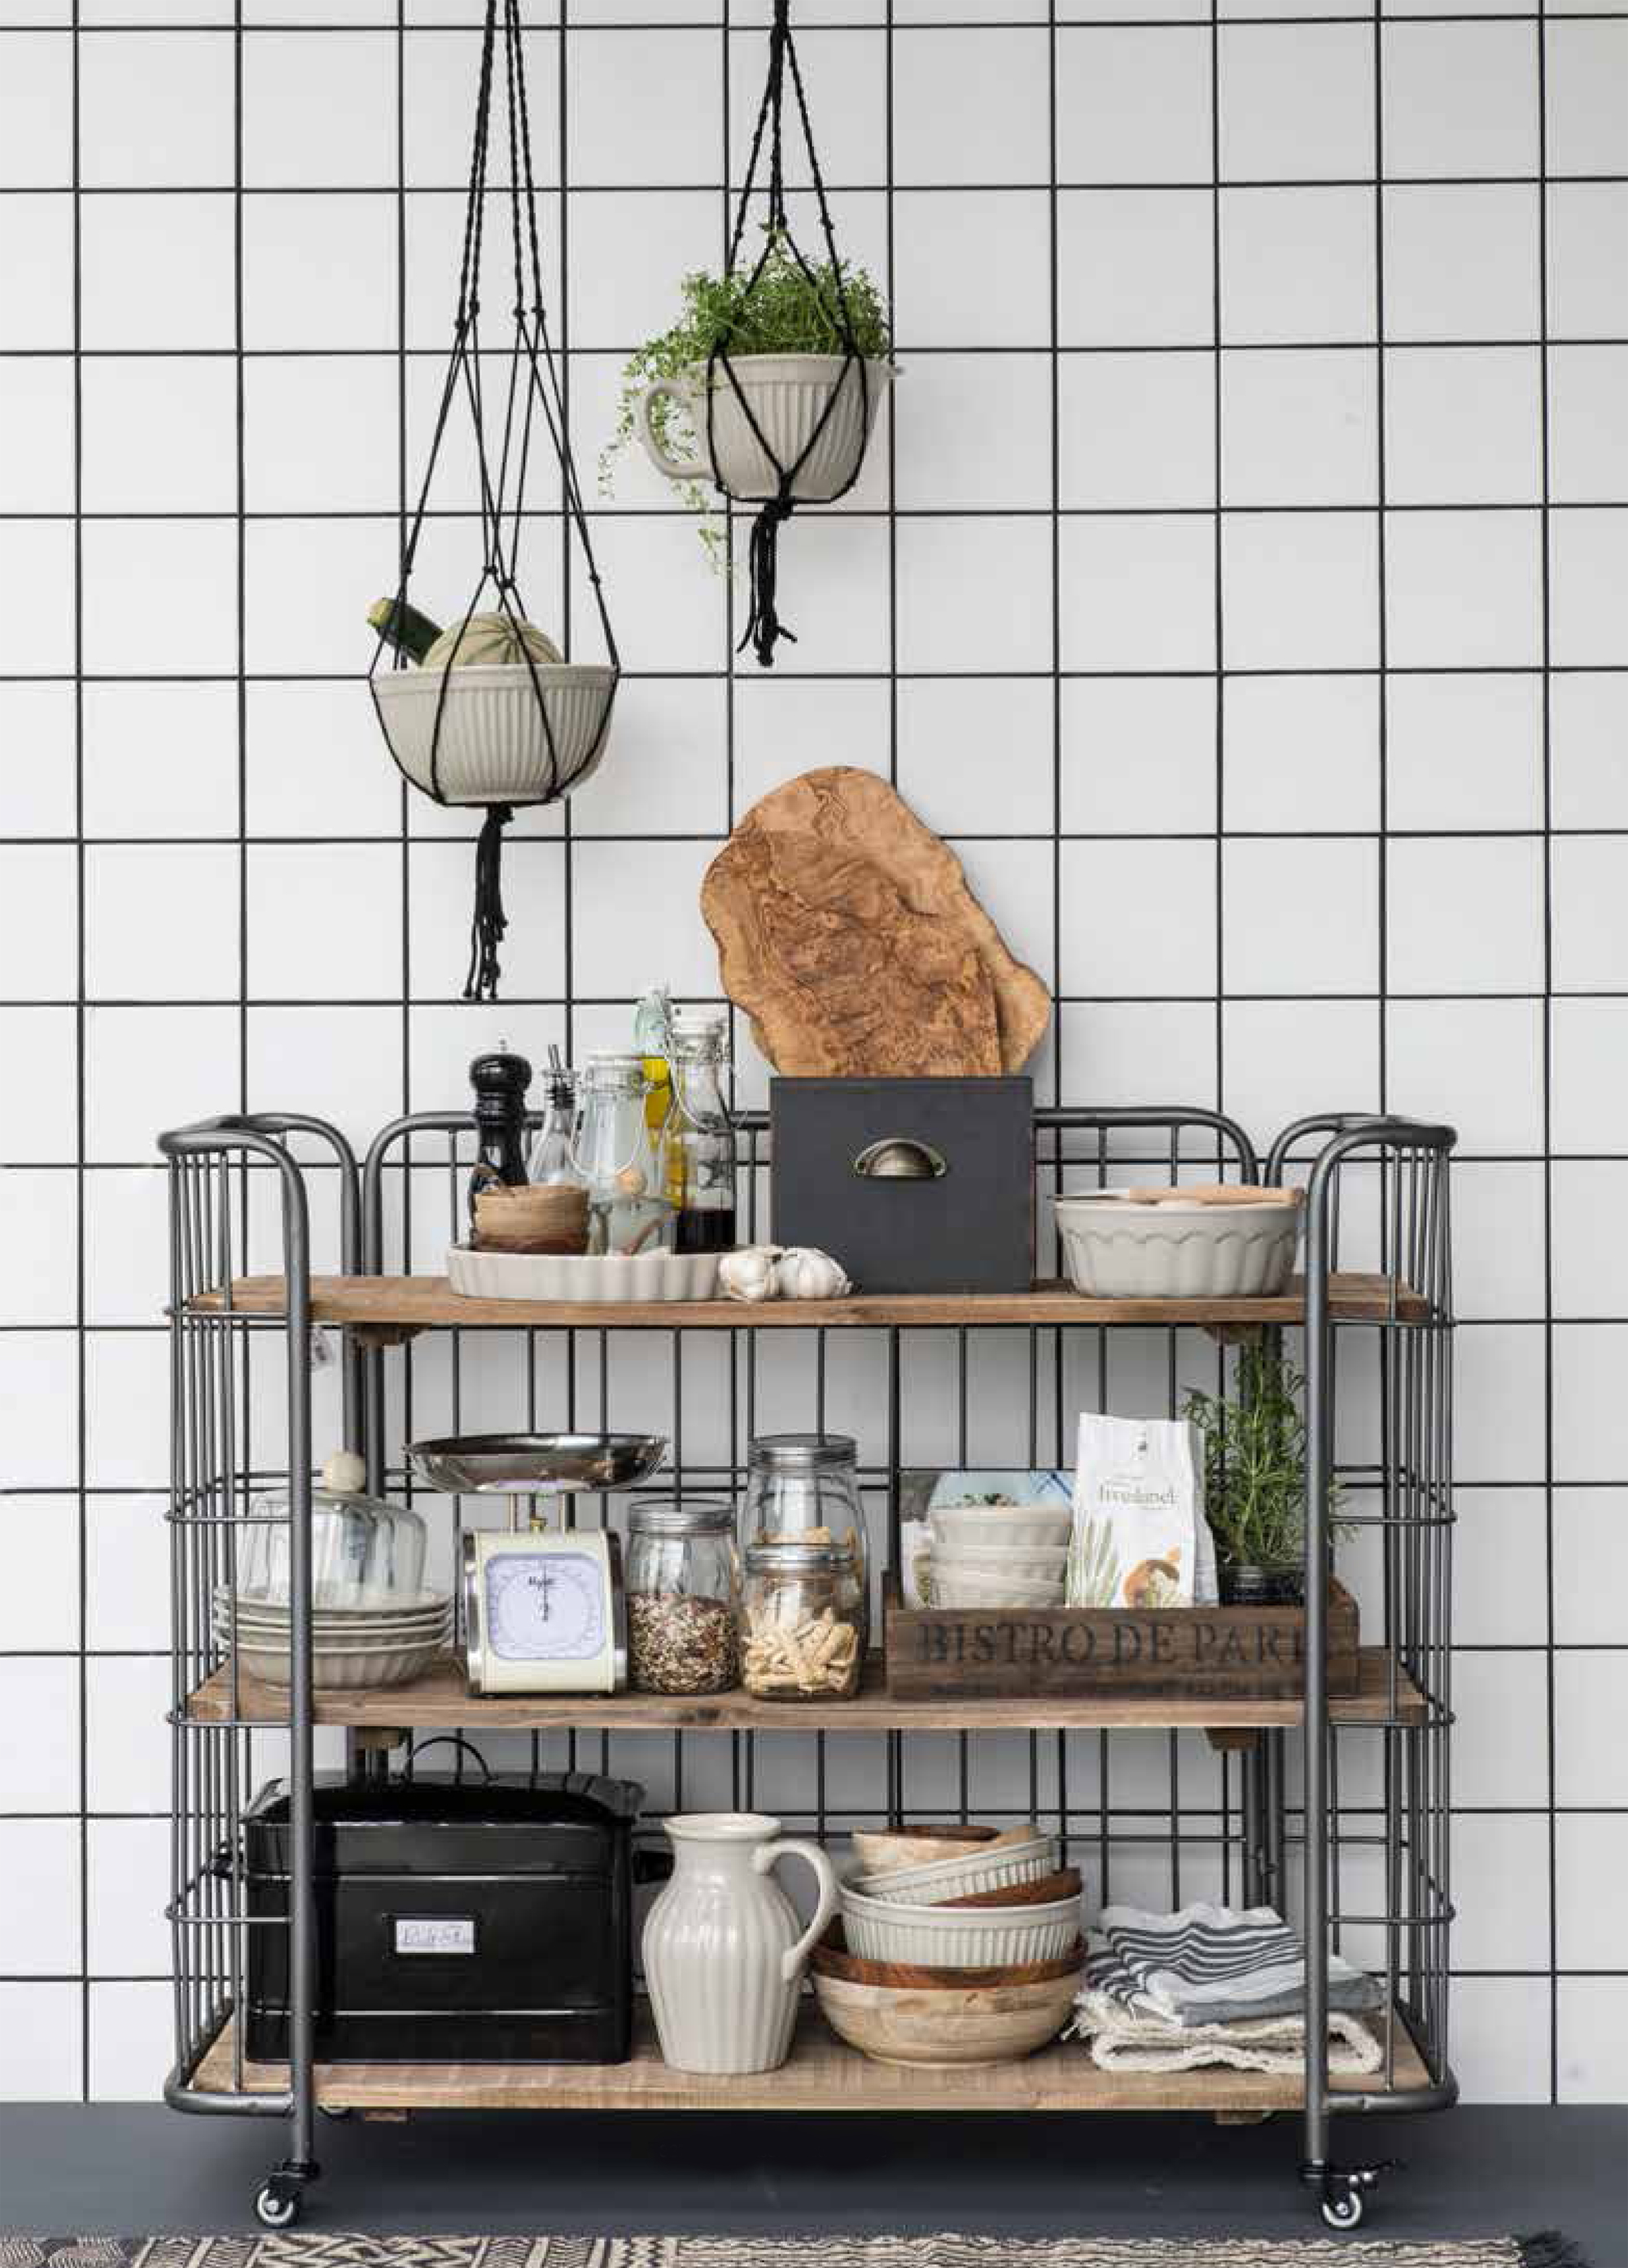 keuken-iblaursen-trolleys